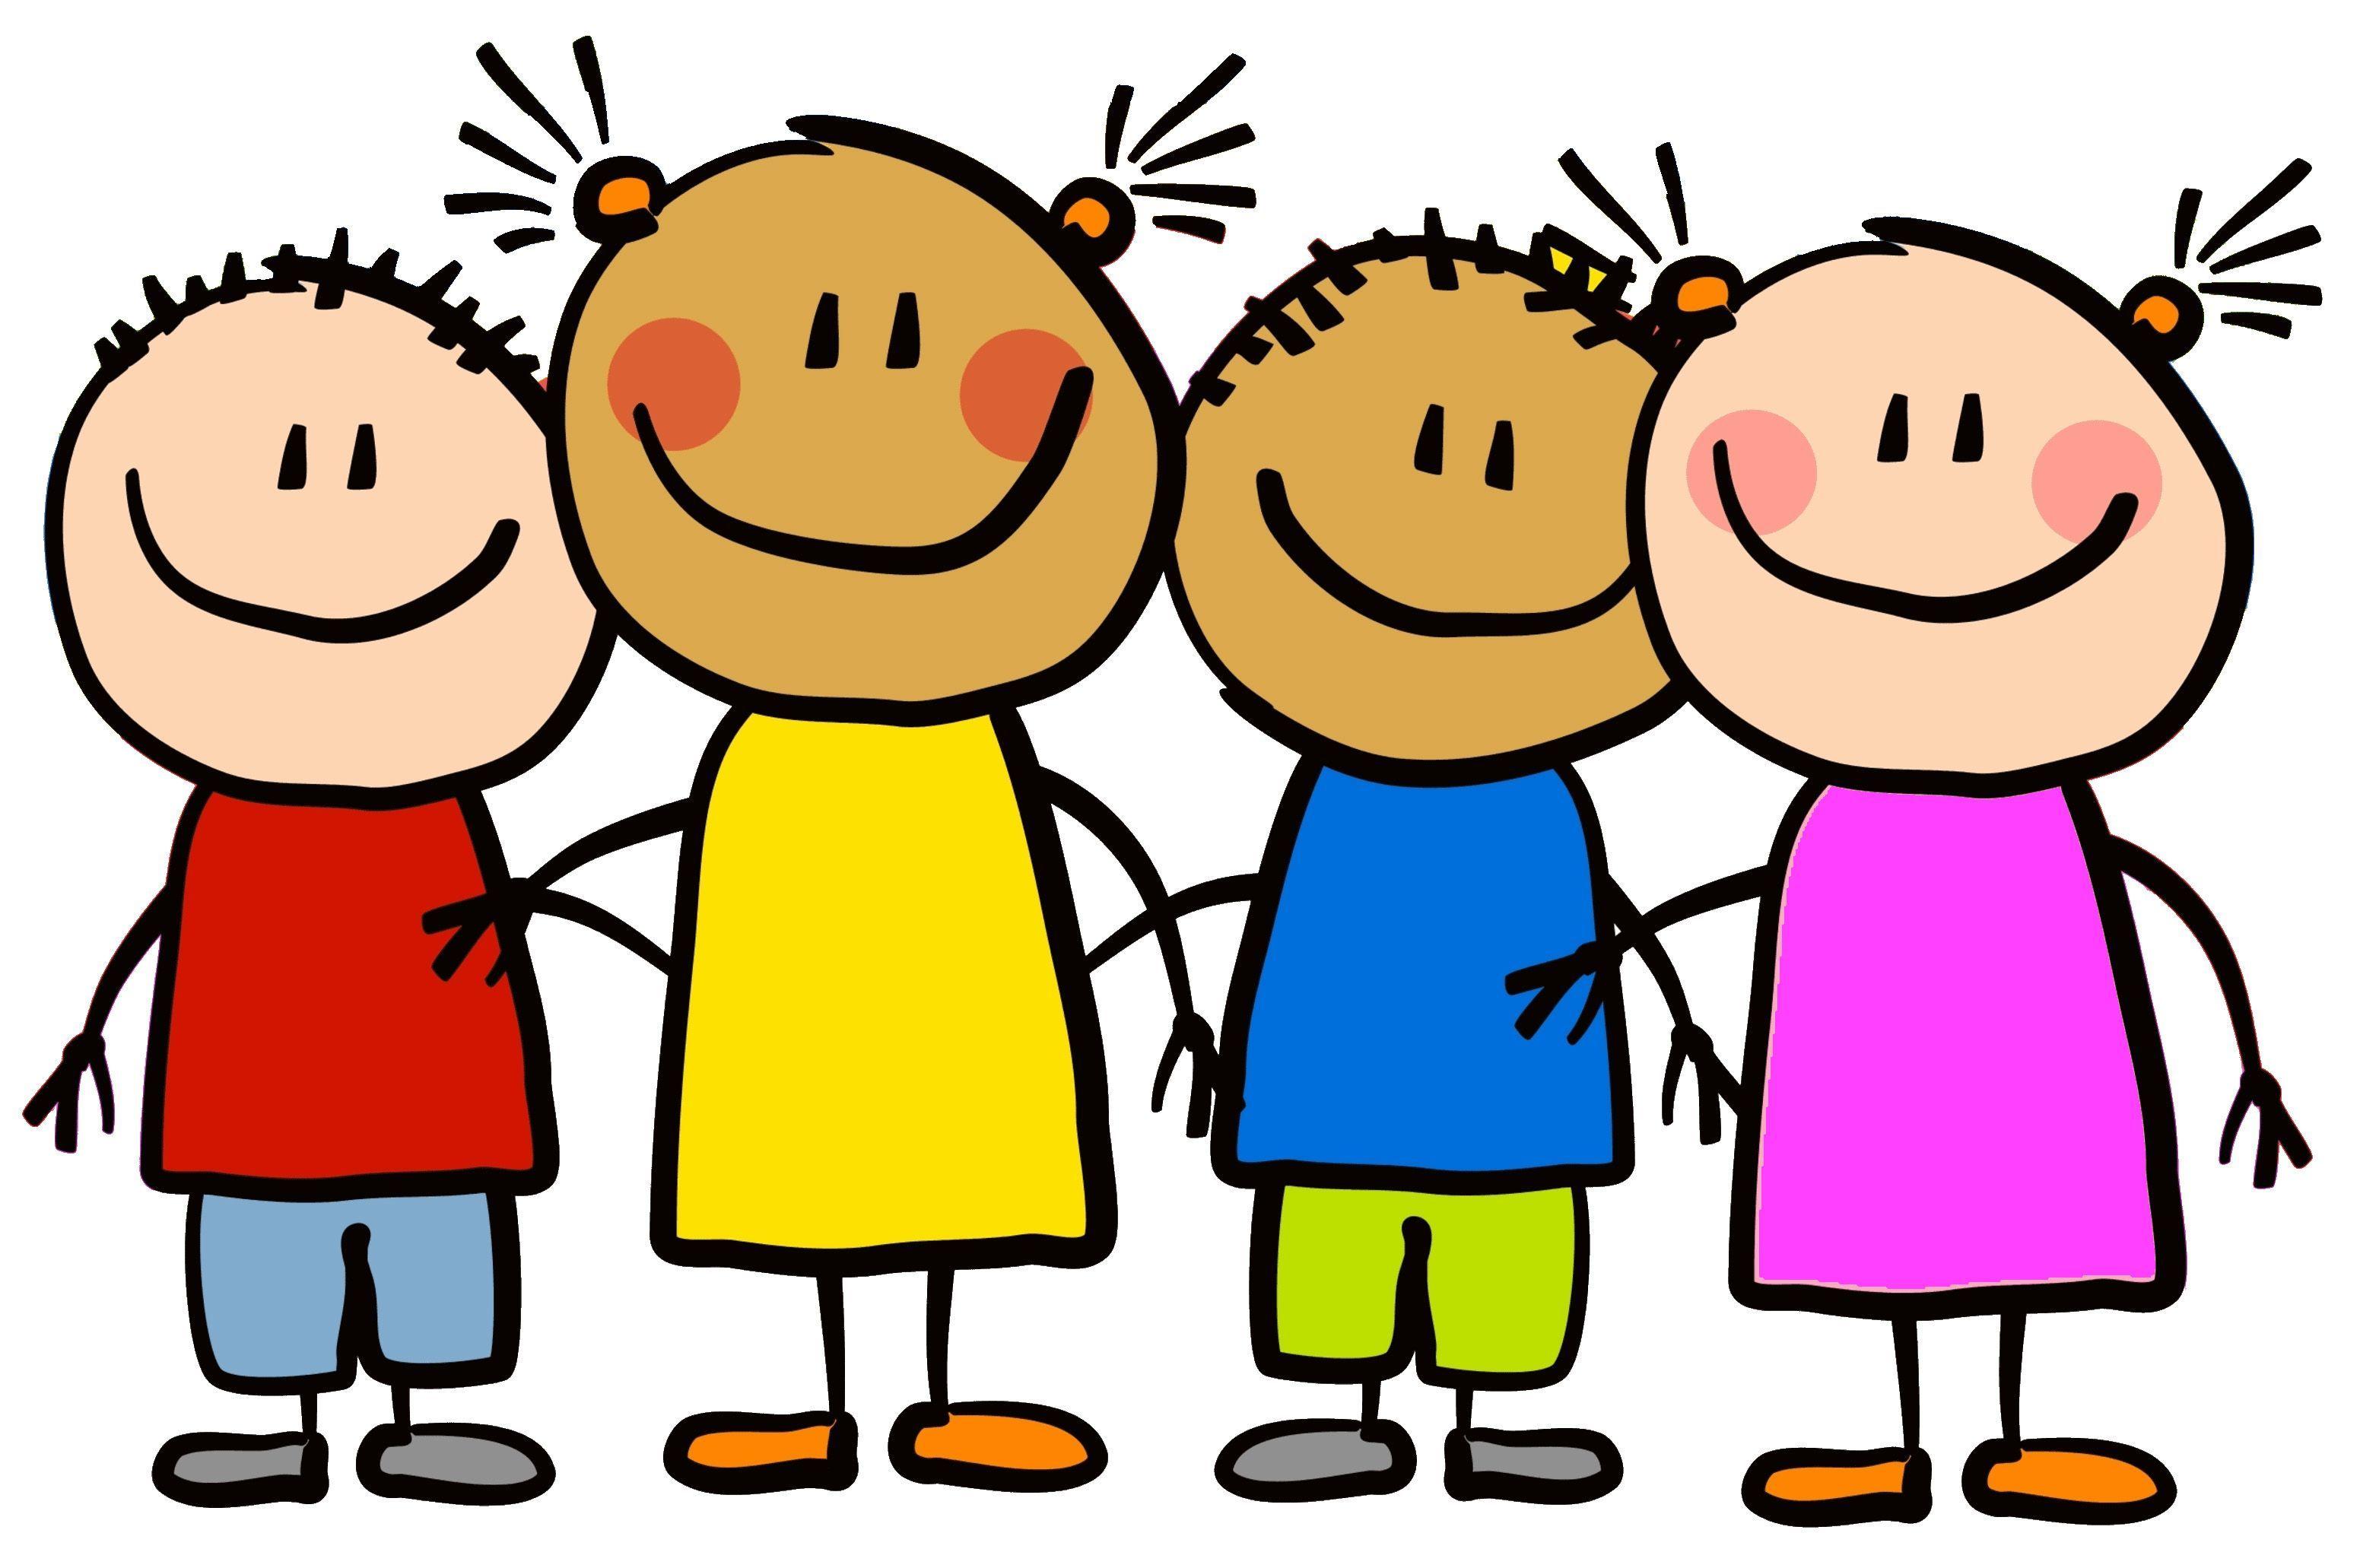 Free childrens clipart pictures. Children portal